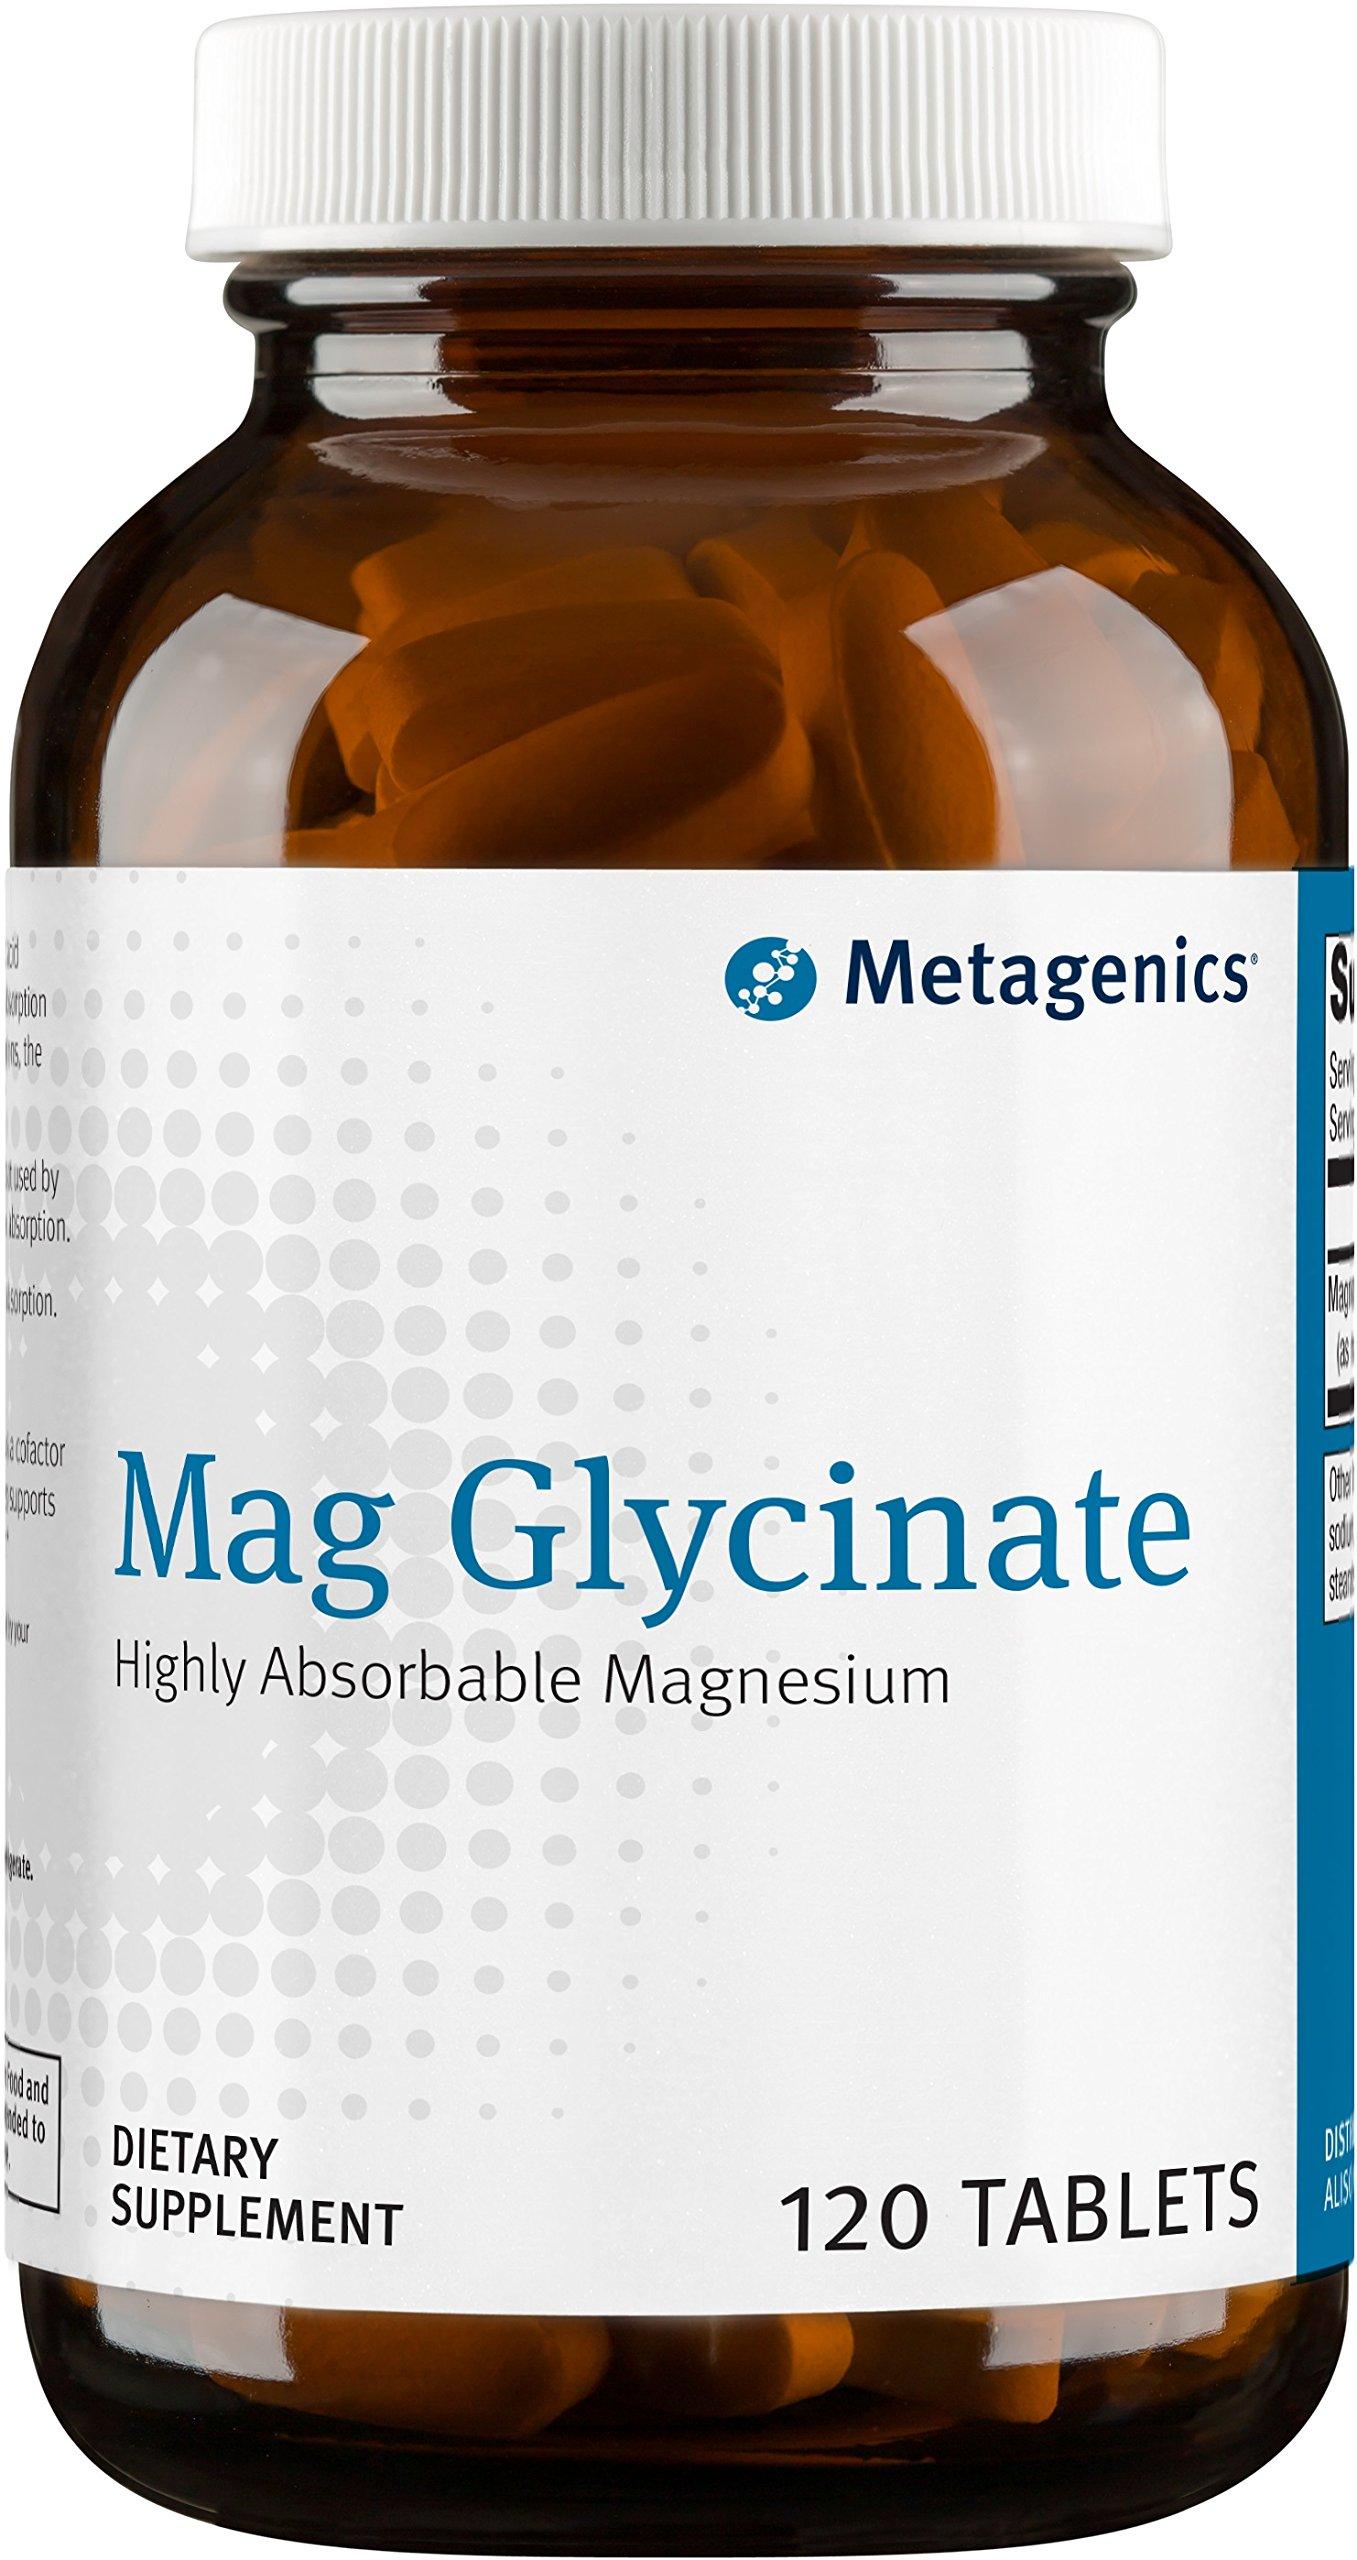 Metagenics - Mag Glycinate, 120 Count